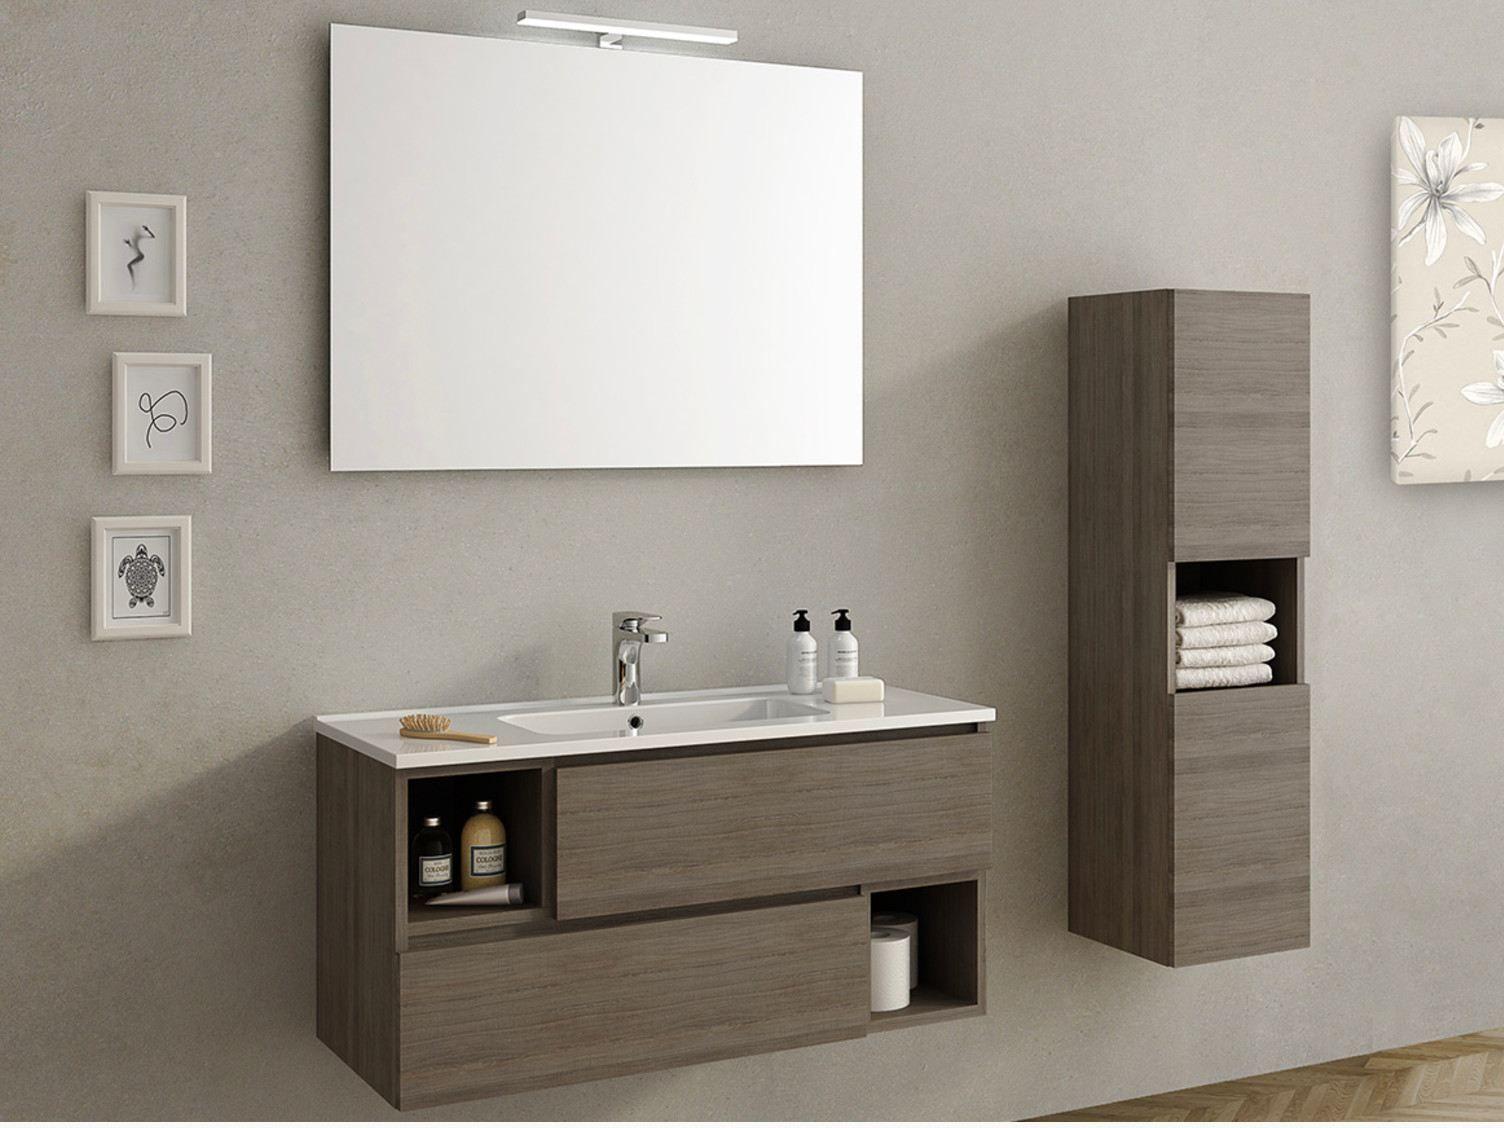 badmöbel moderner stil | archiproducts, Hause ideen